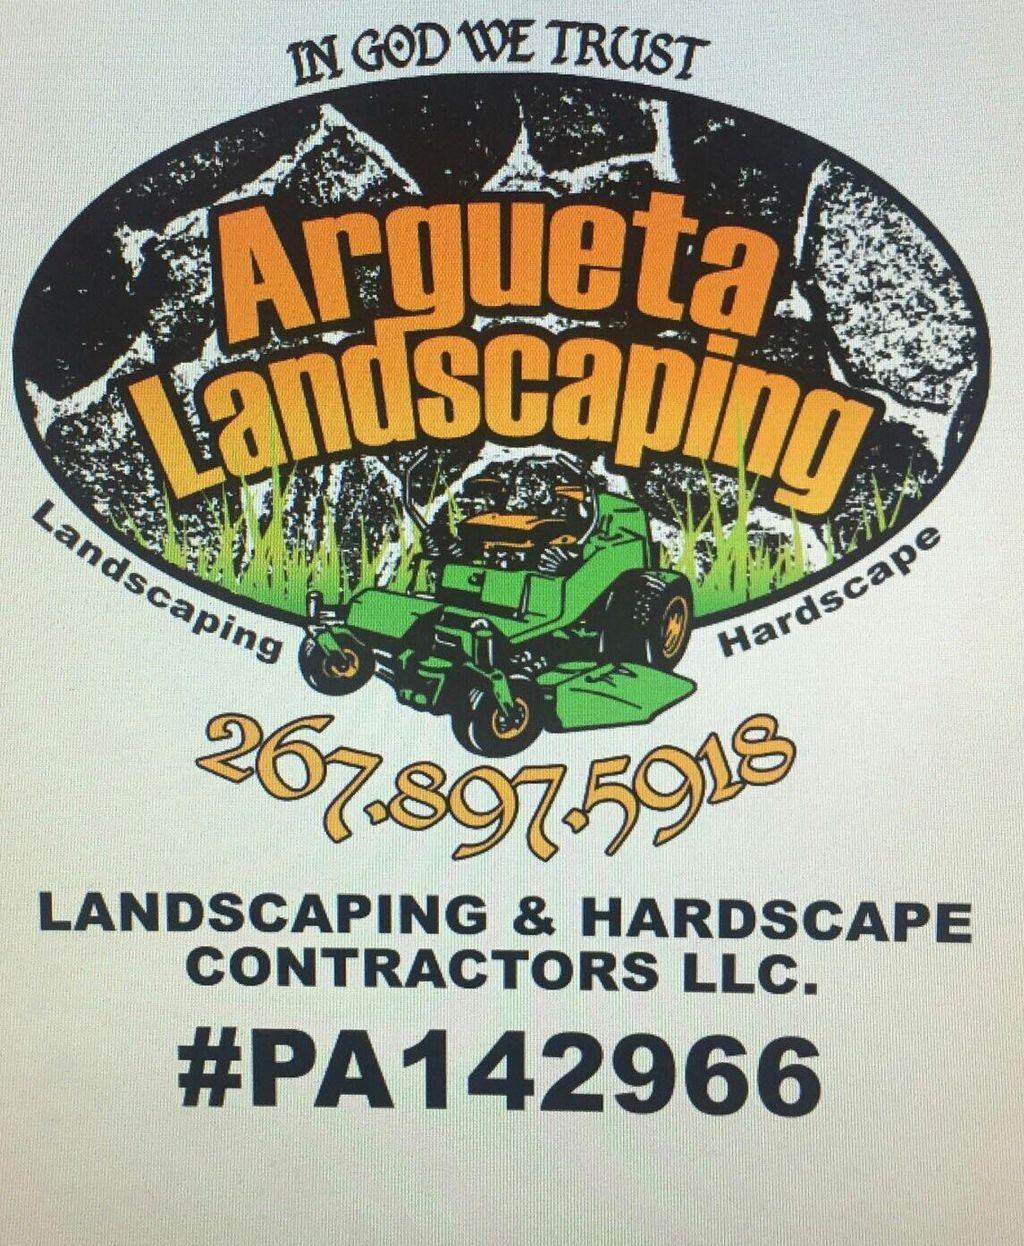 Argueta Landscaping & Hardscape